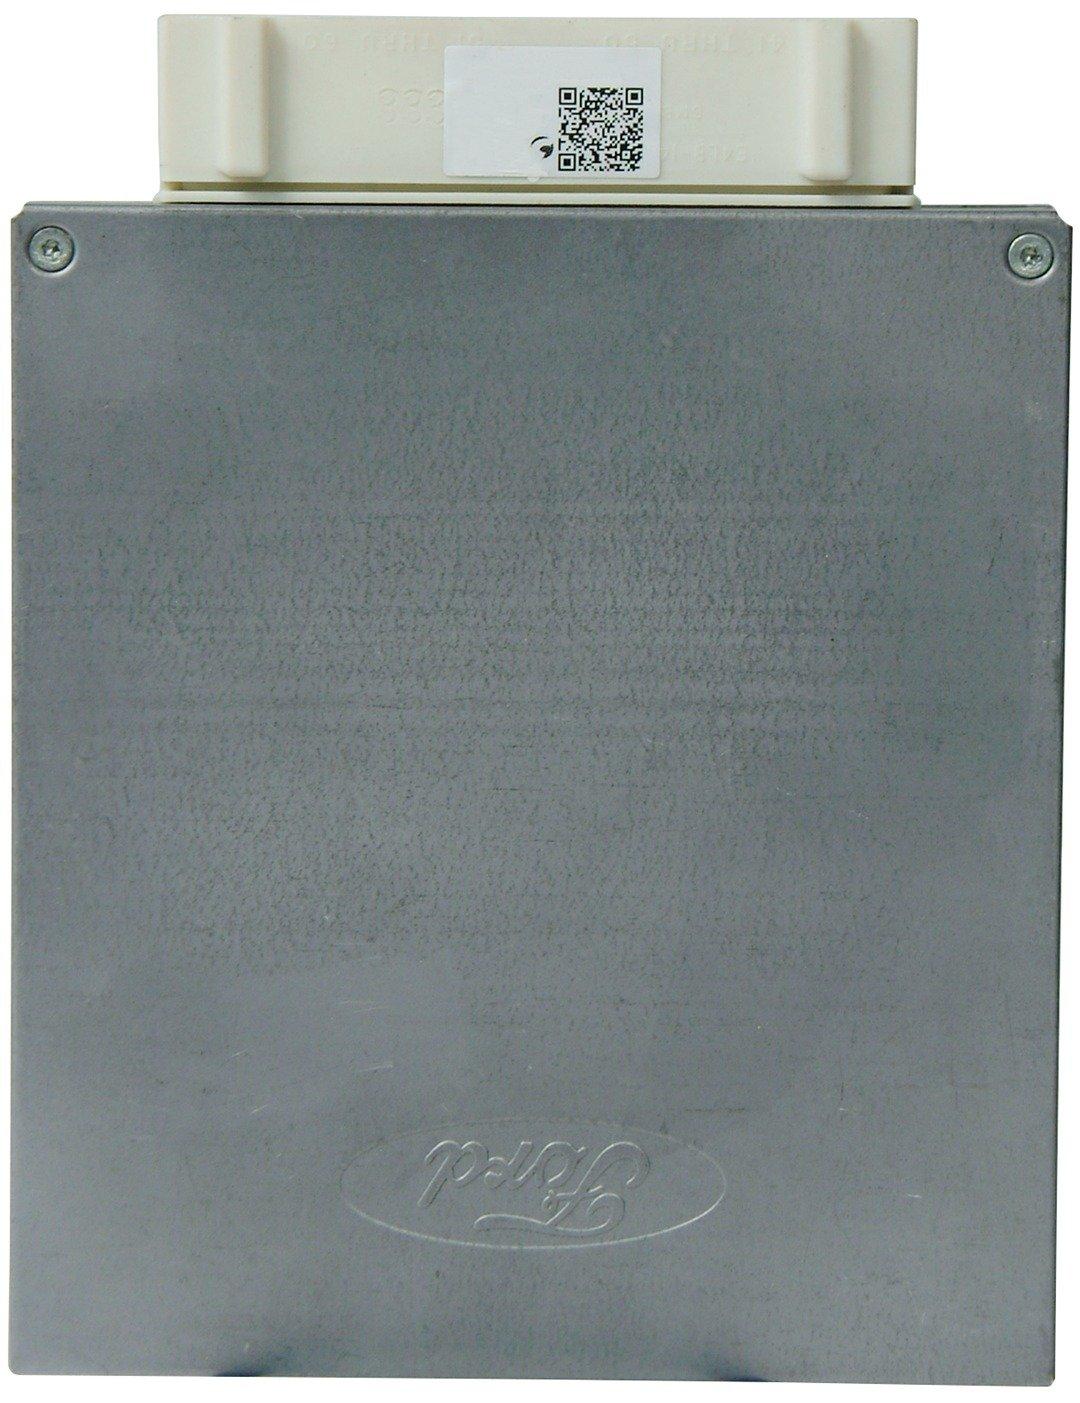 Cardone 78-4391 Remanufactured Ford Computer A1 Cardone 784391AAF